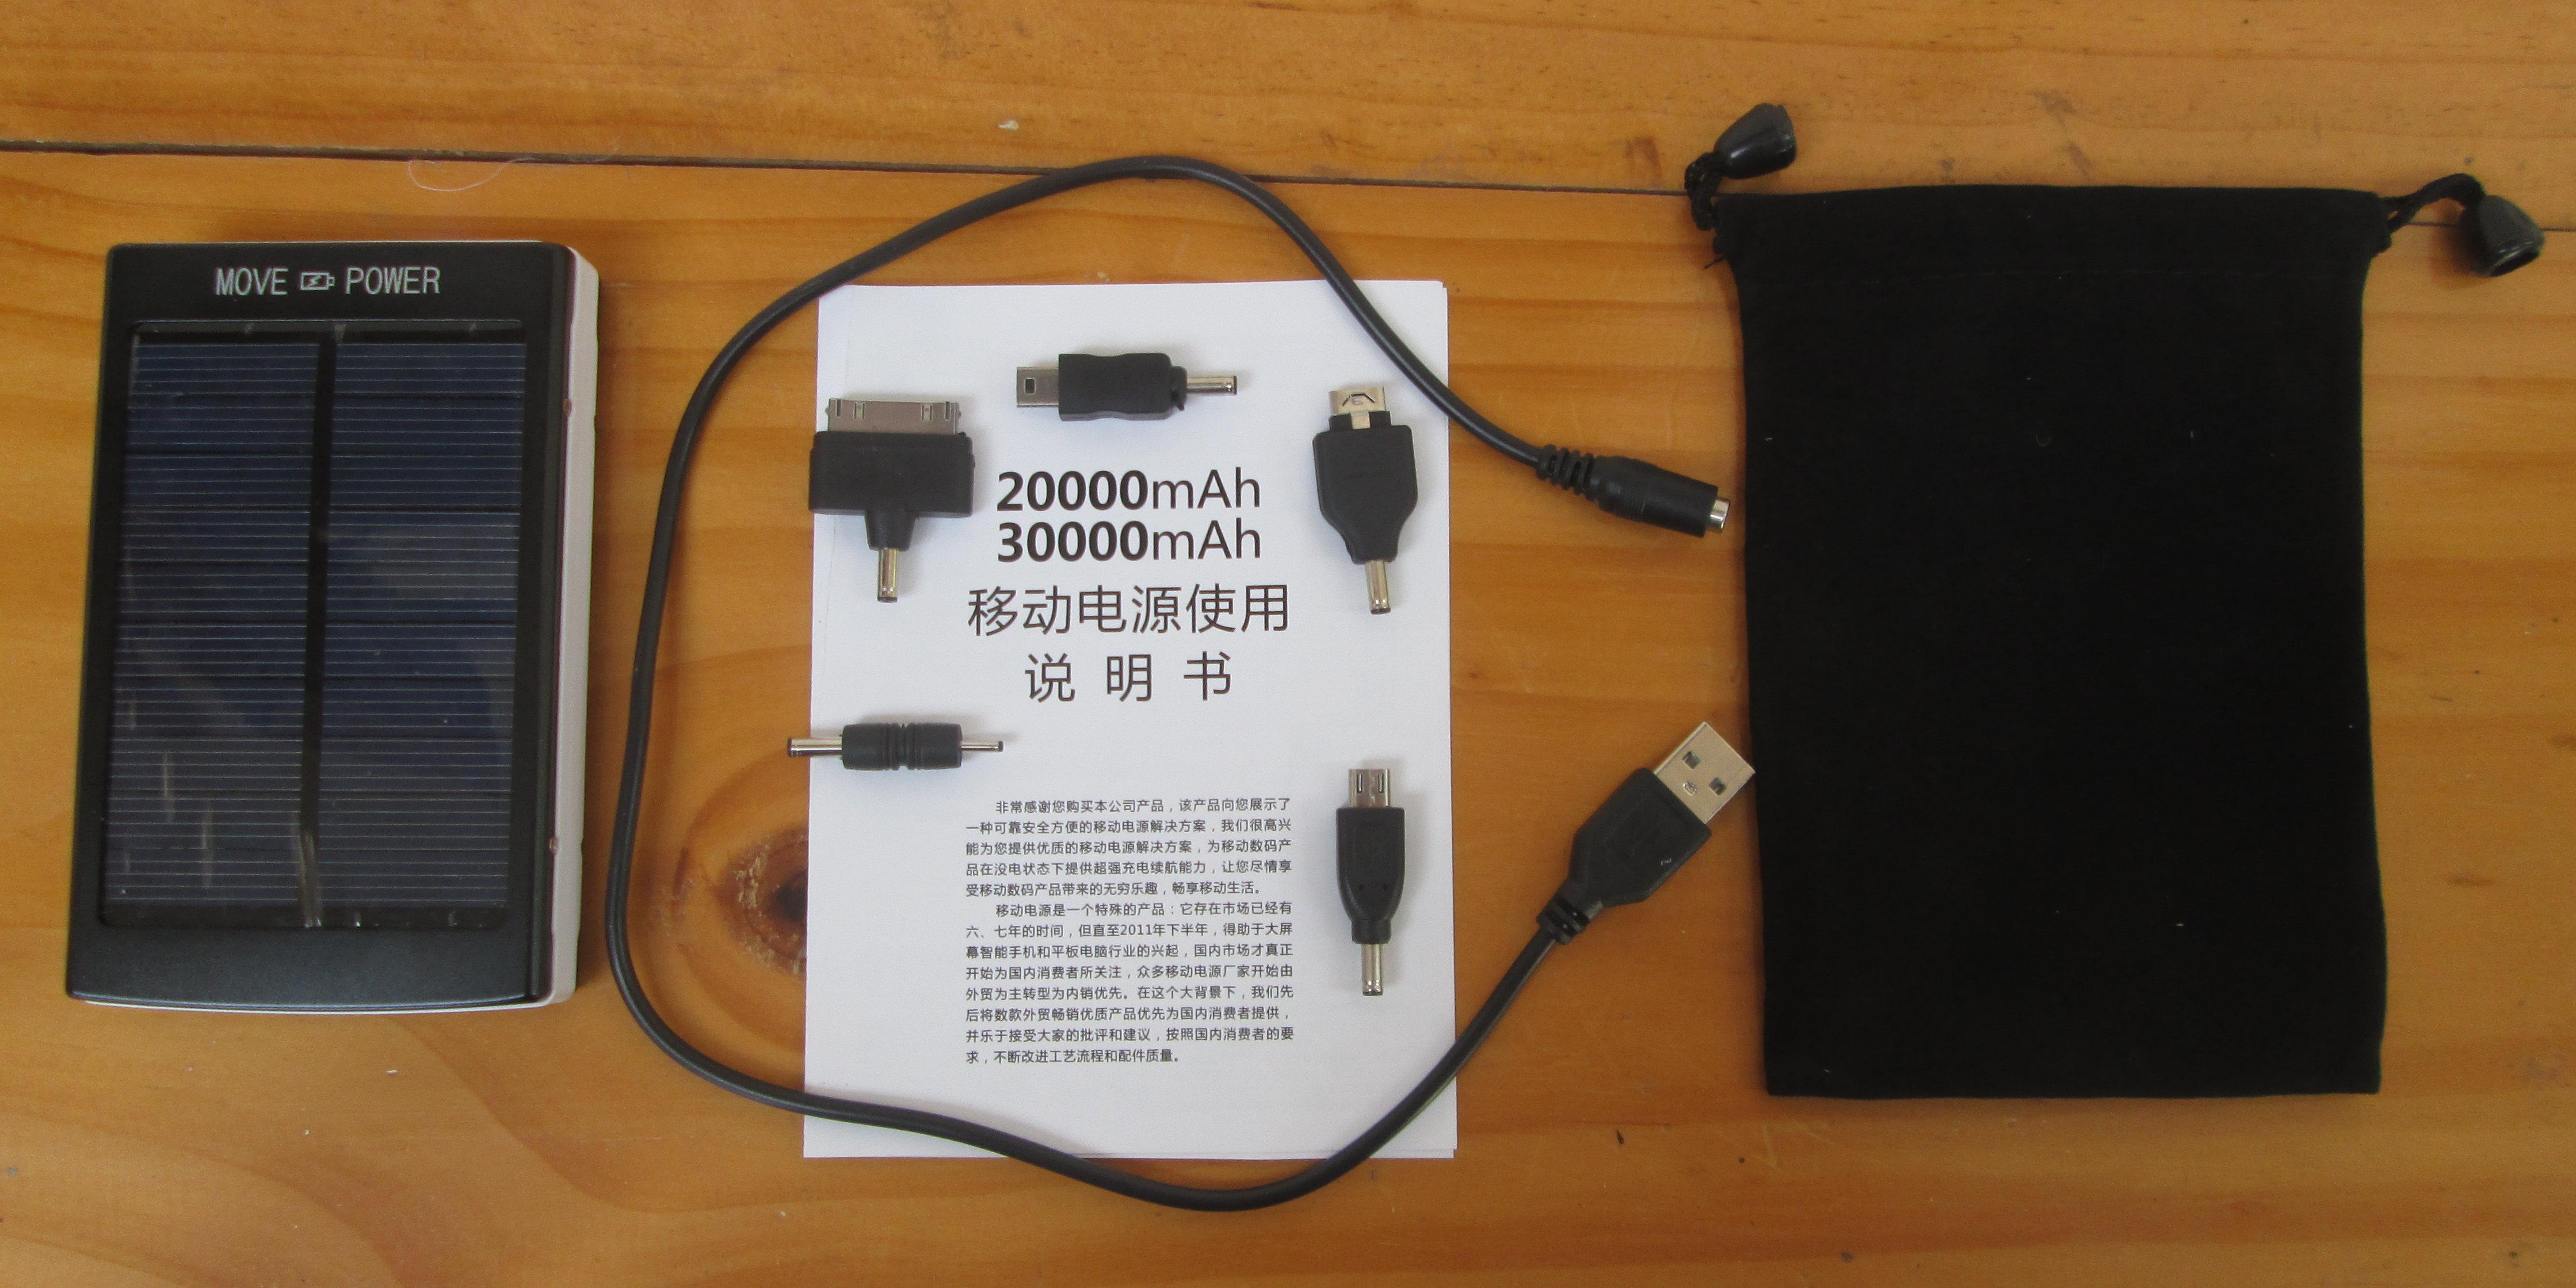 China 10000mah portable solar charger, rohs manual, solar power.